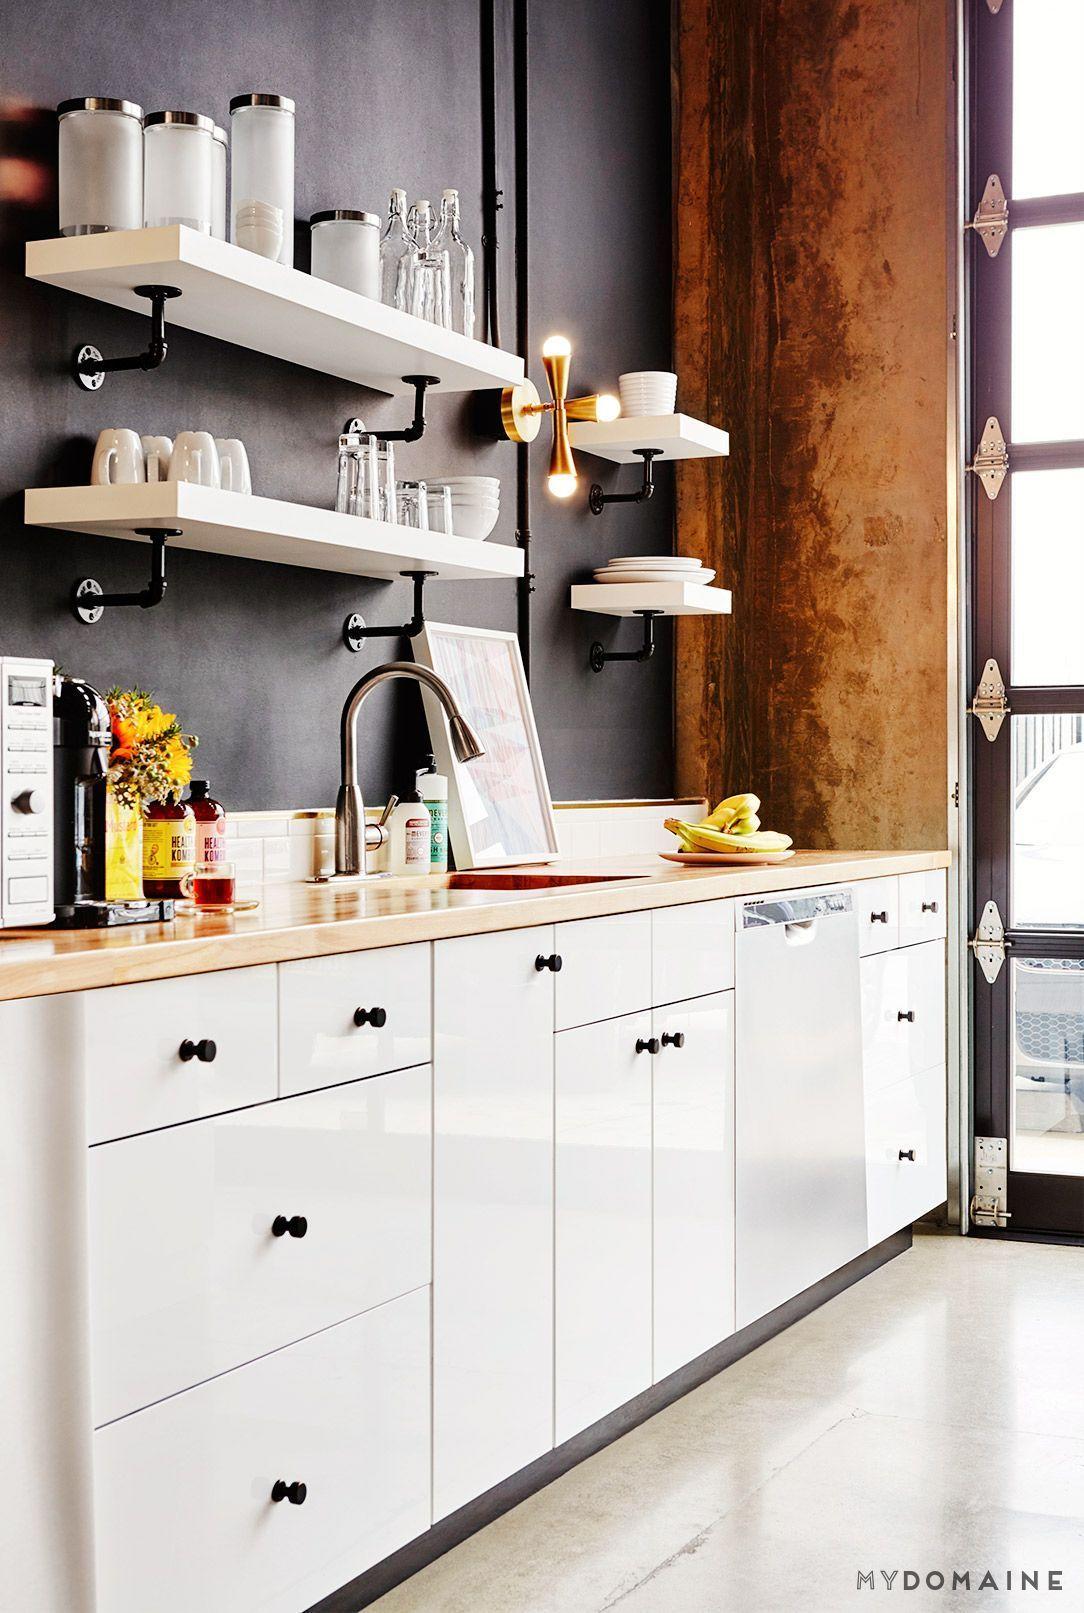 Office Kitchen With Black Walls White Shelves White Cabinets Wood Countertops And Gray F Kitchenette Design Industrial Kitchen Design Modern Kitchen Design